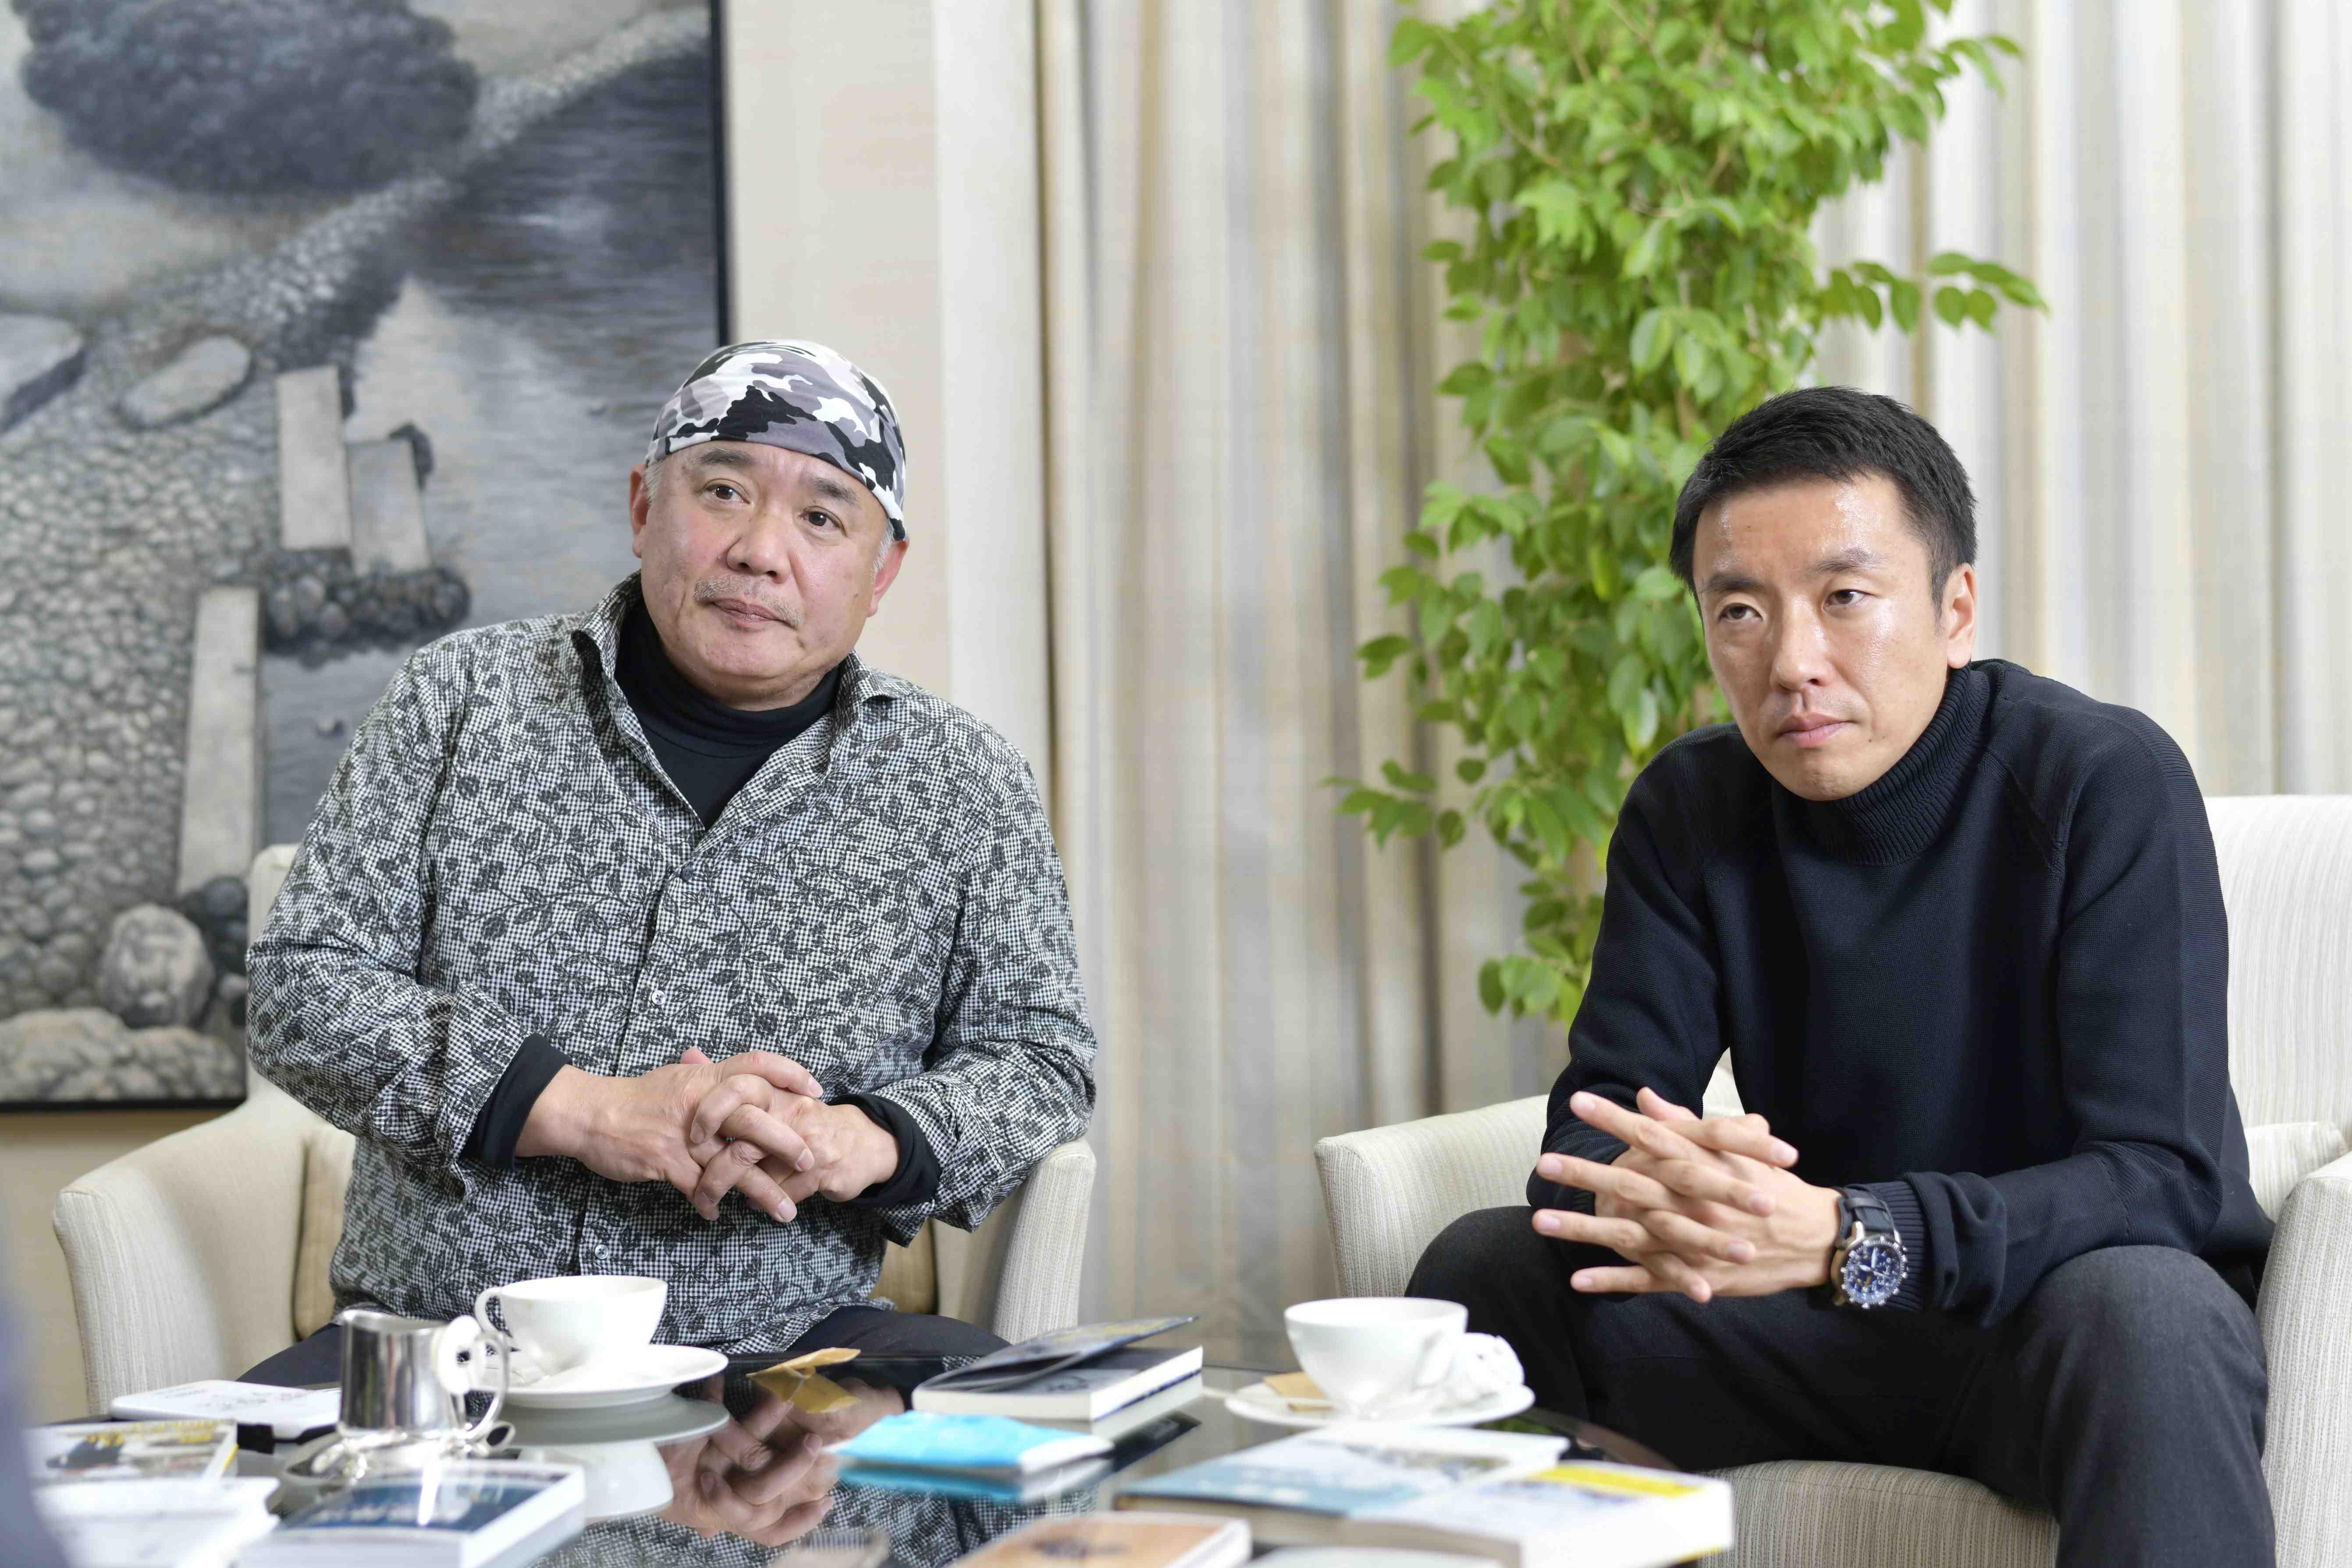 Interview with Bon Ishikawa on new documentary Film Kujira Bito 132